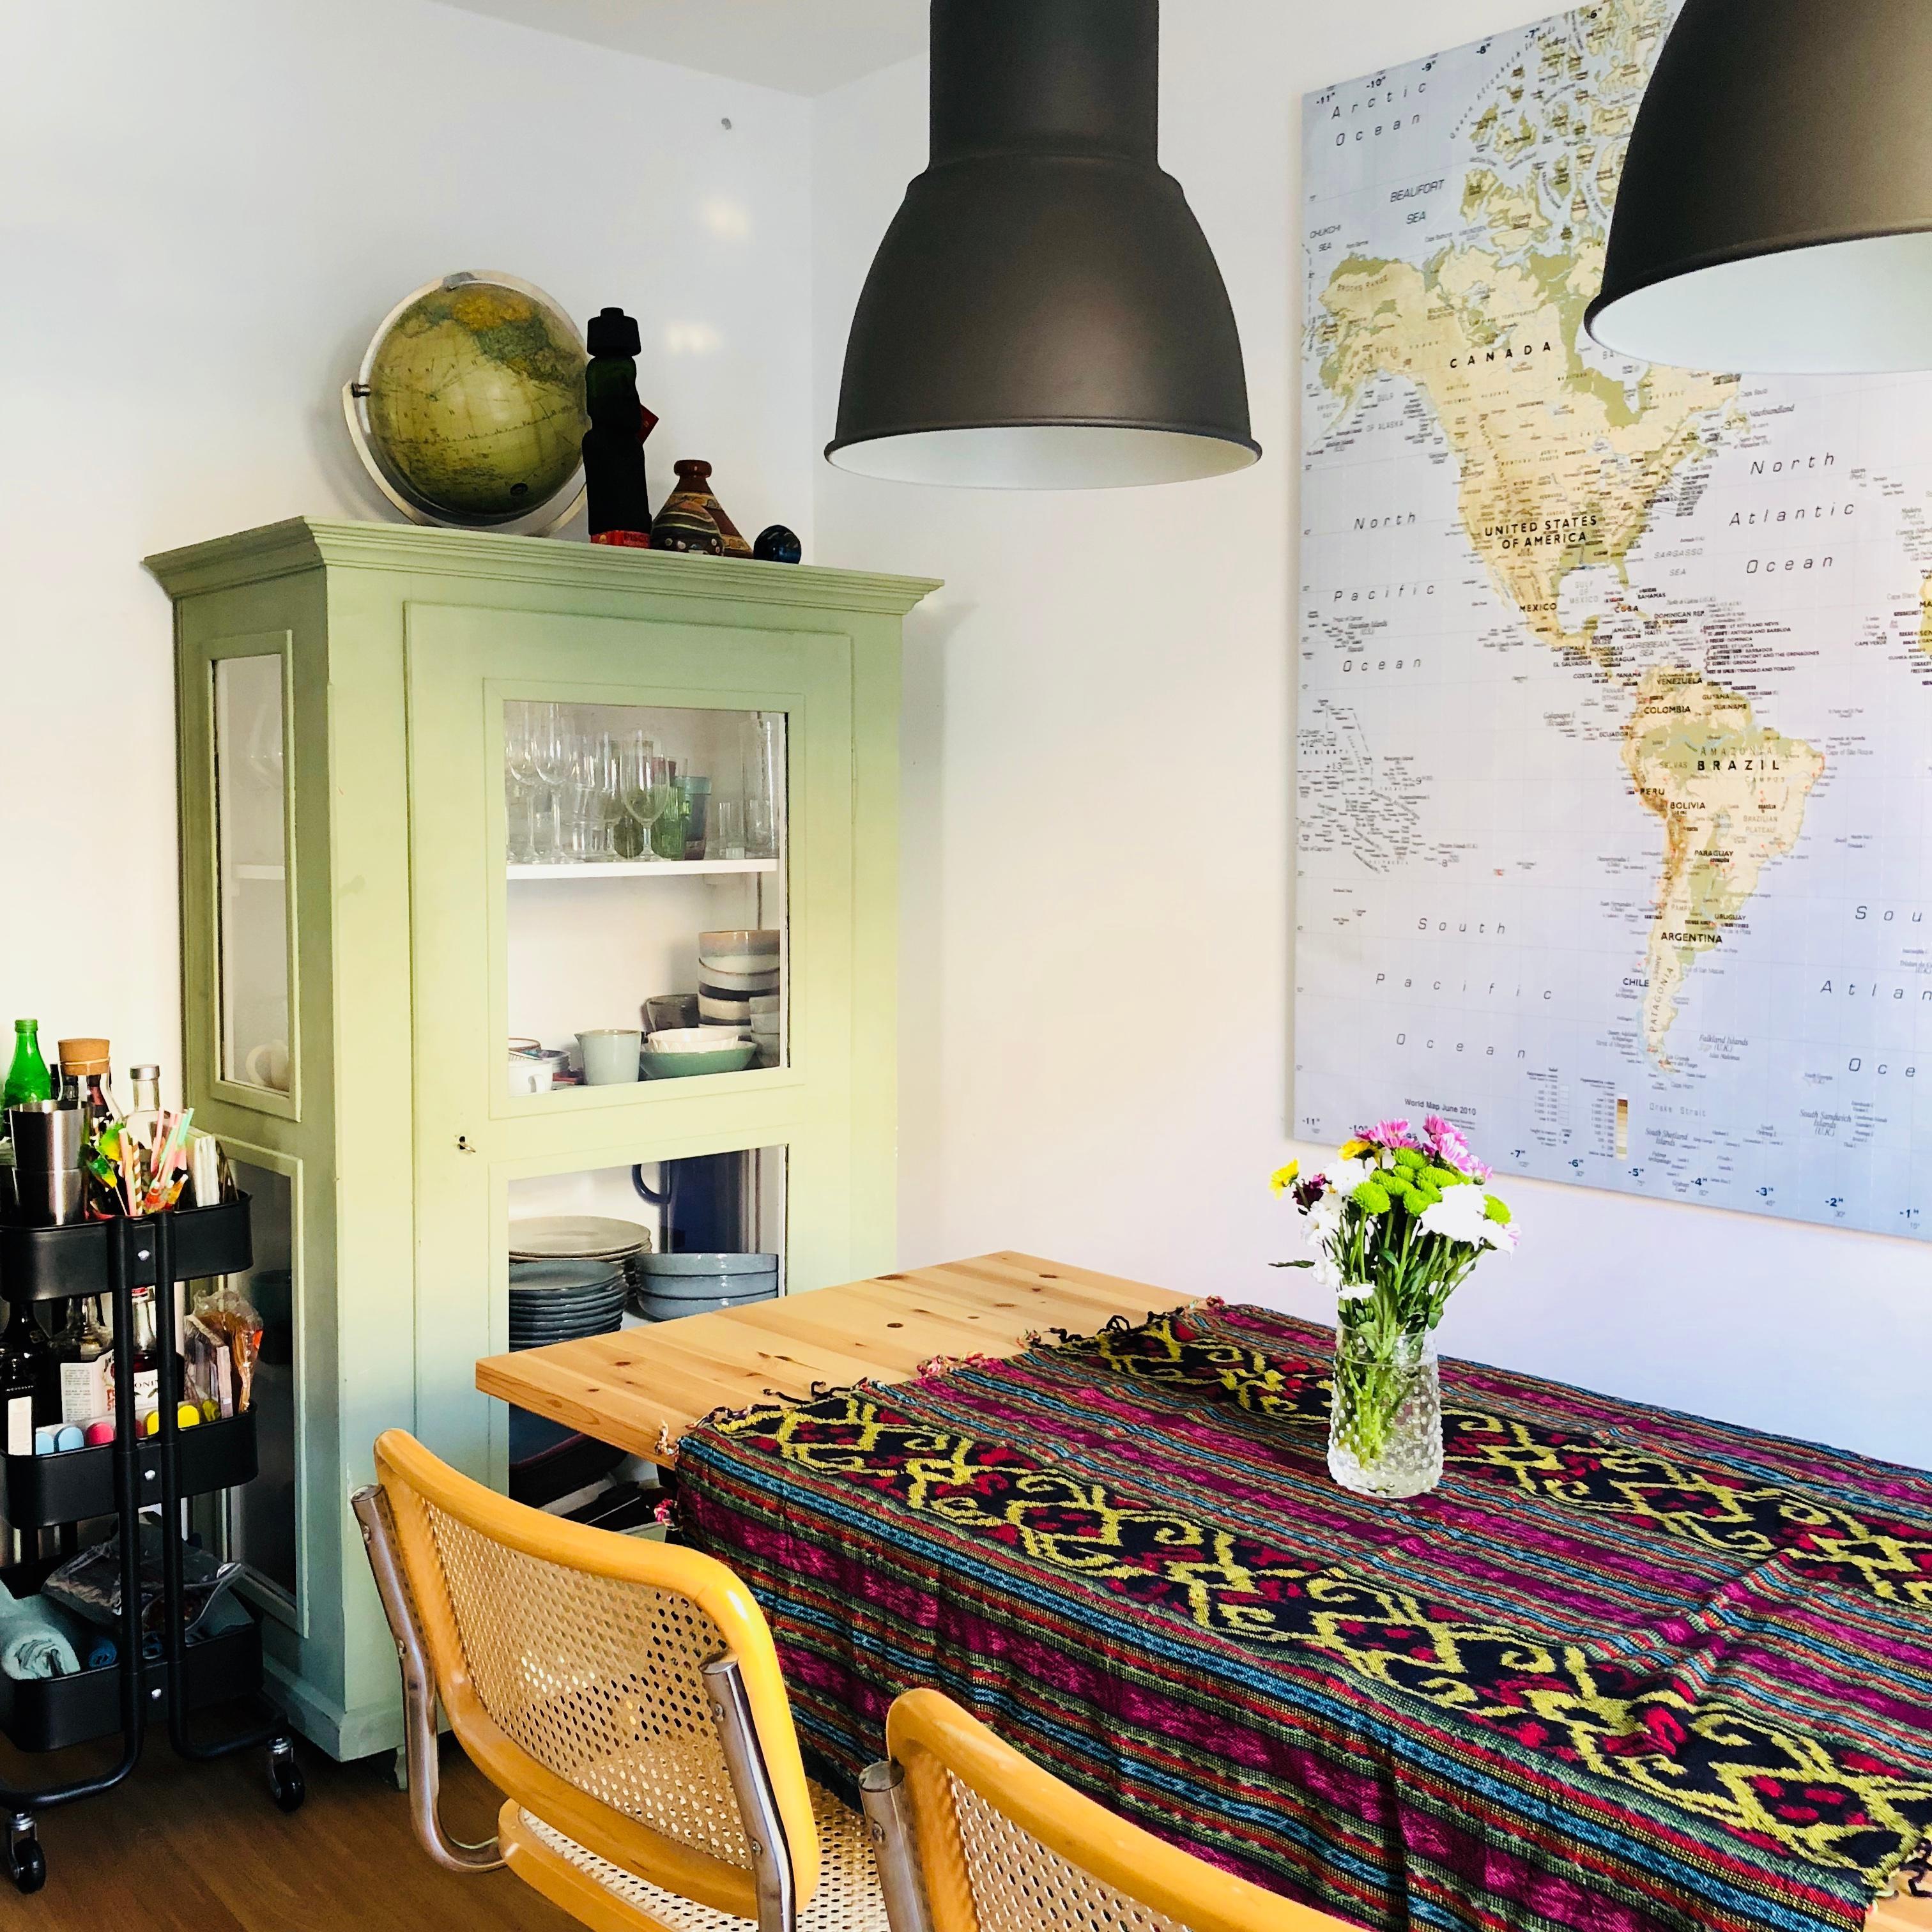 ikea bilder ideen couch. Black Bedroom Furniture Sets. Home Design Ideas